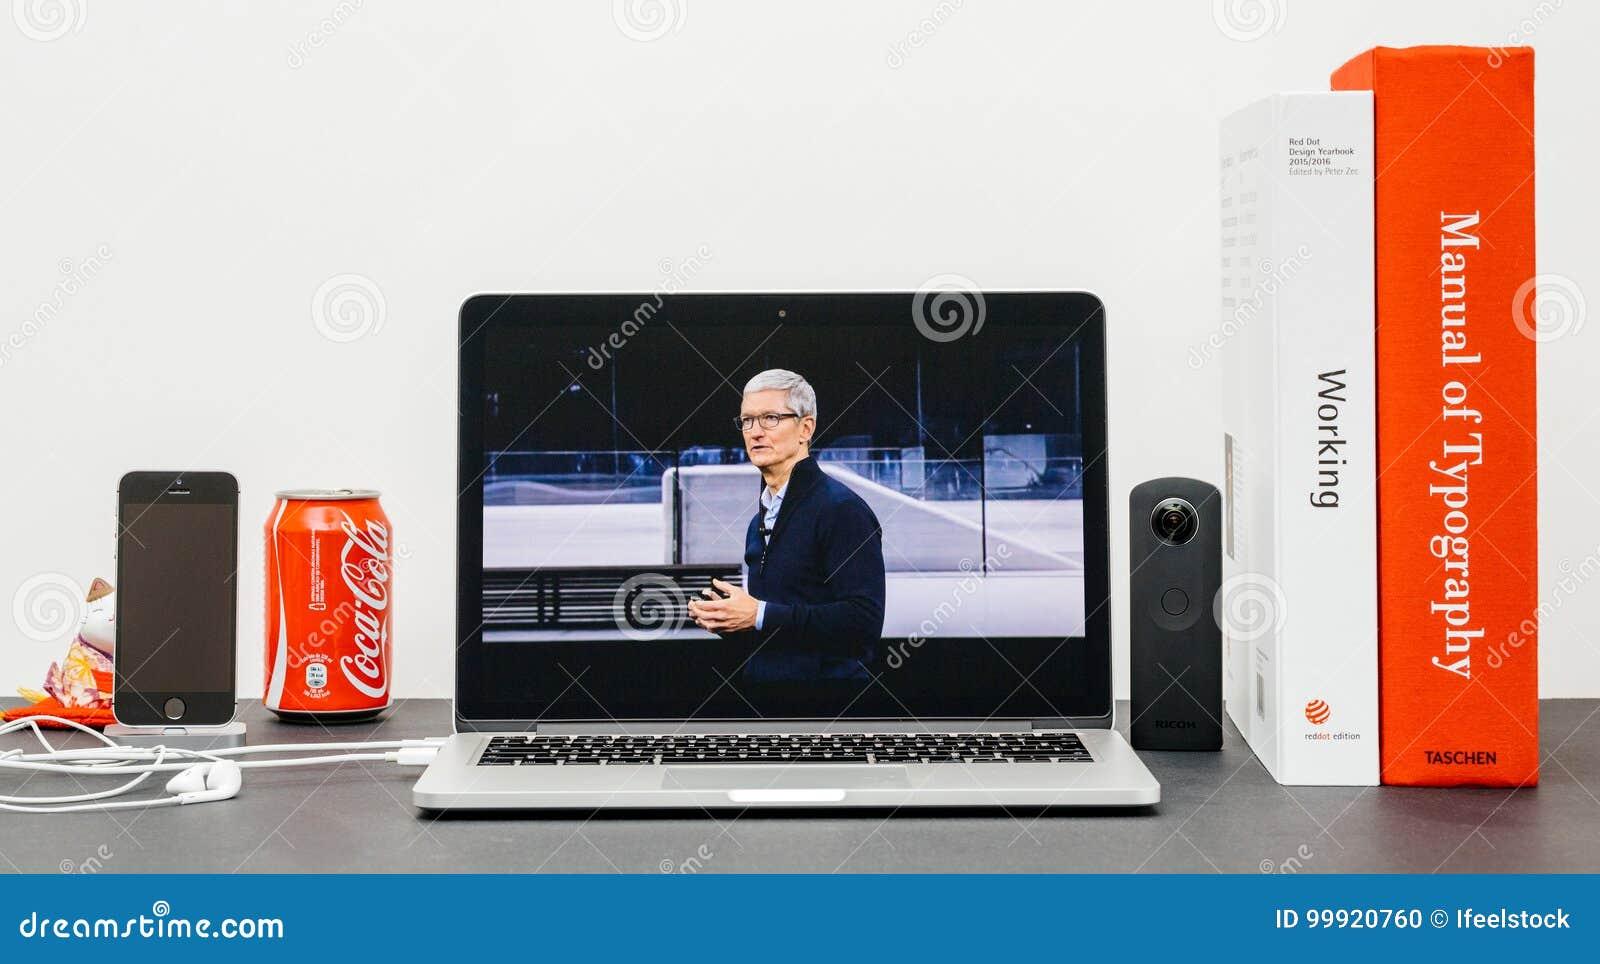 Den Apple grundtanken med Tim Cook farvälhänder avslutar grundtanke